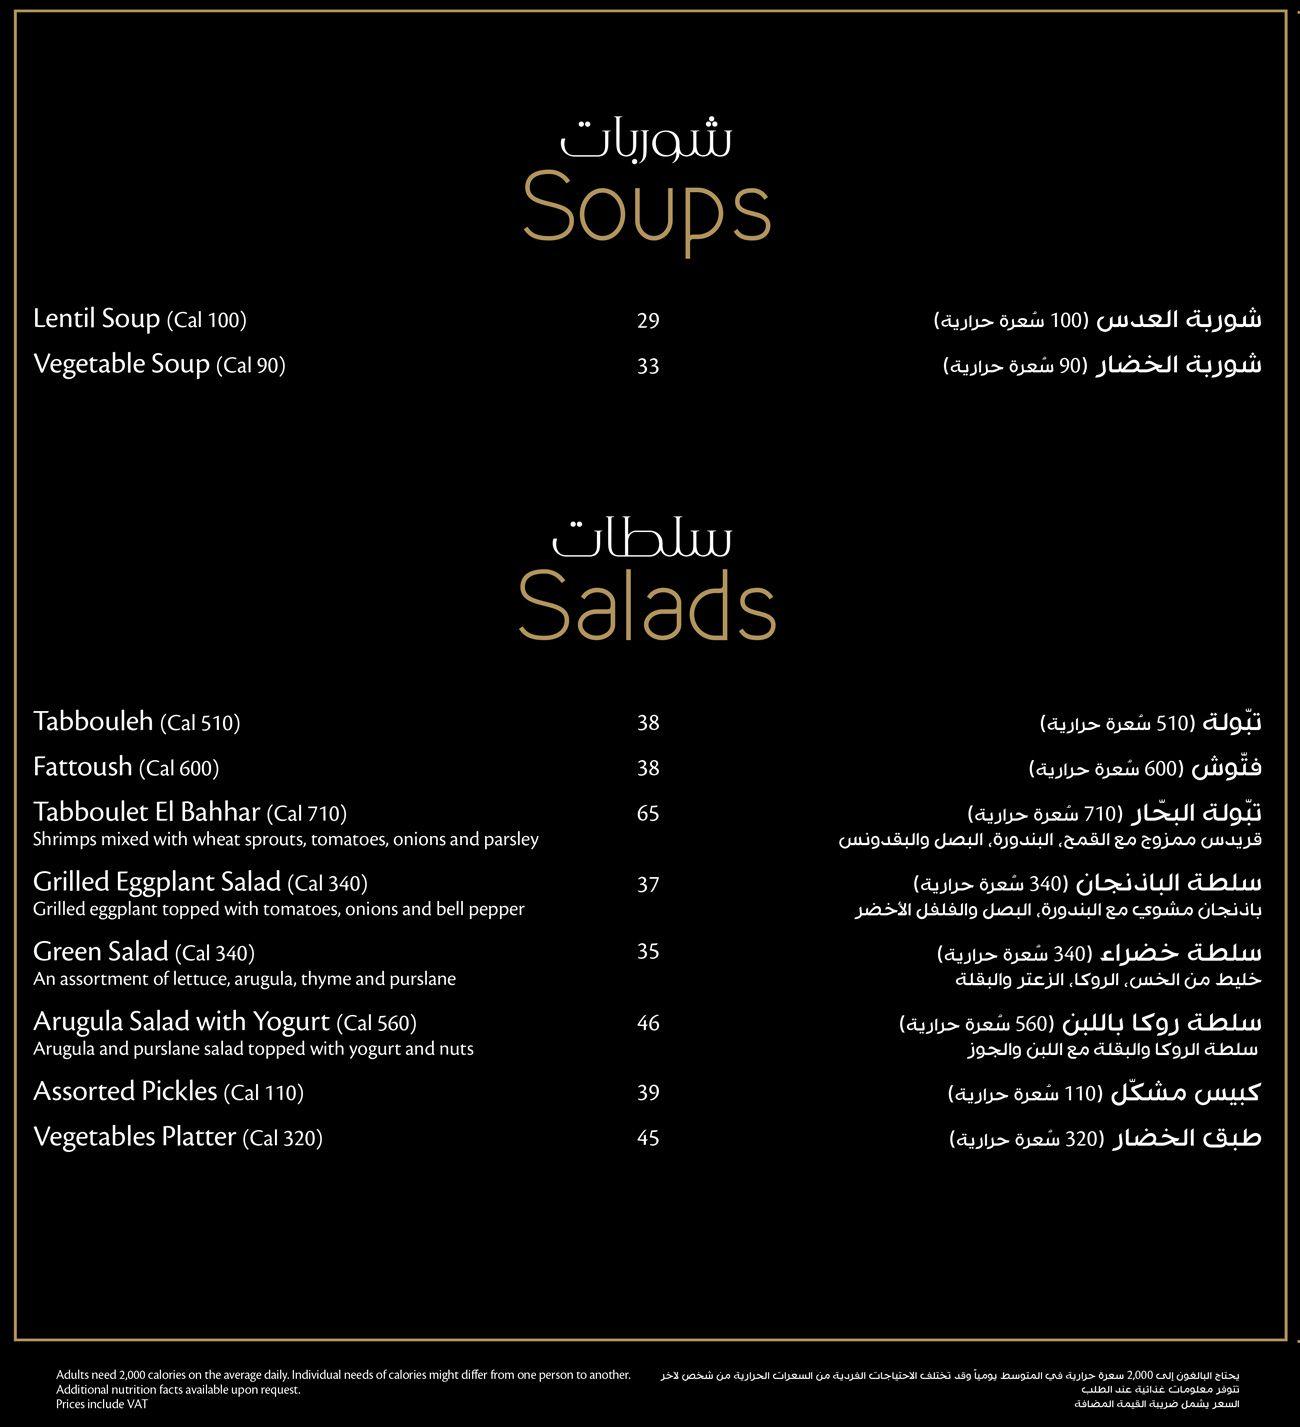 Pin By Omniyah Adel On مطاعم الشرقيه In 2020 Lentil Soup Vegetable Soup Tabbouleh